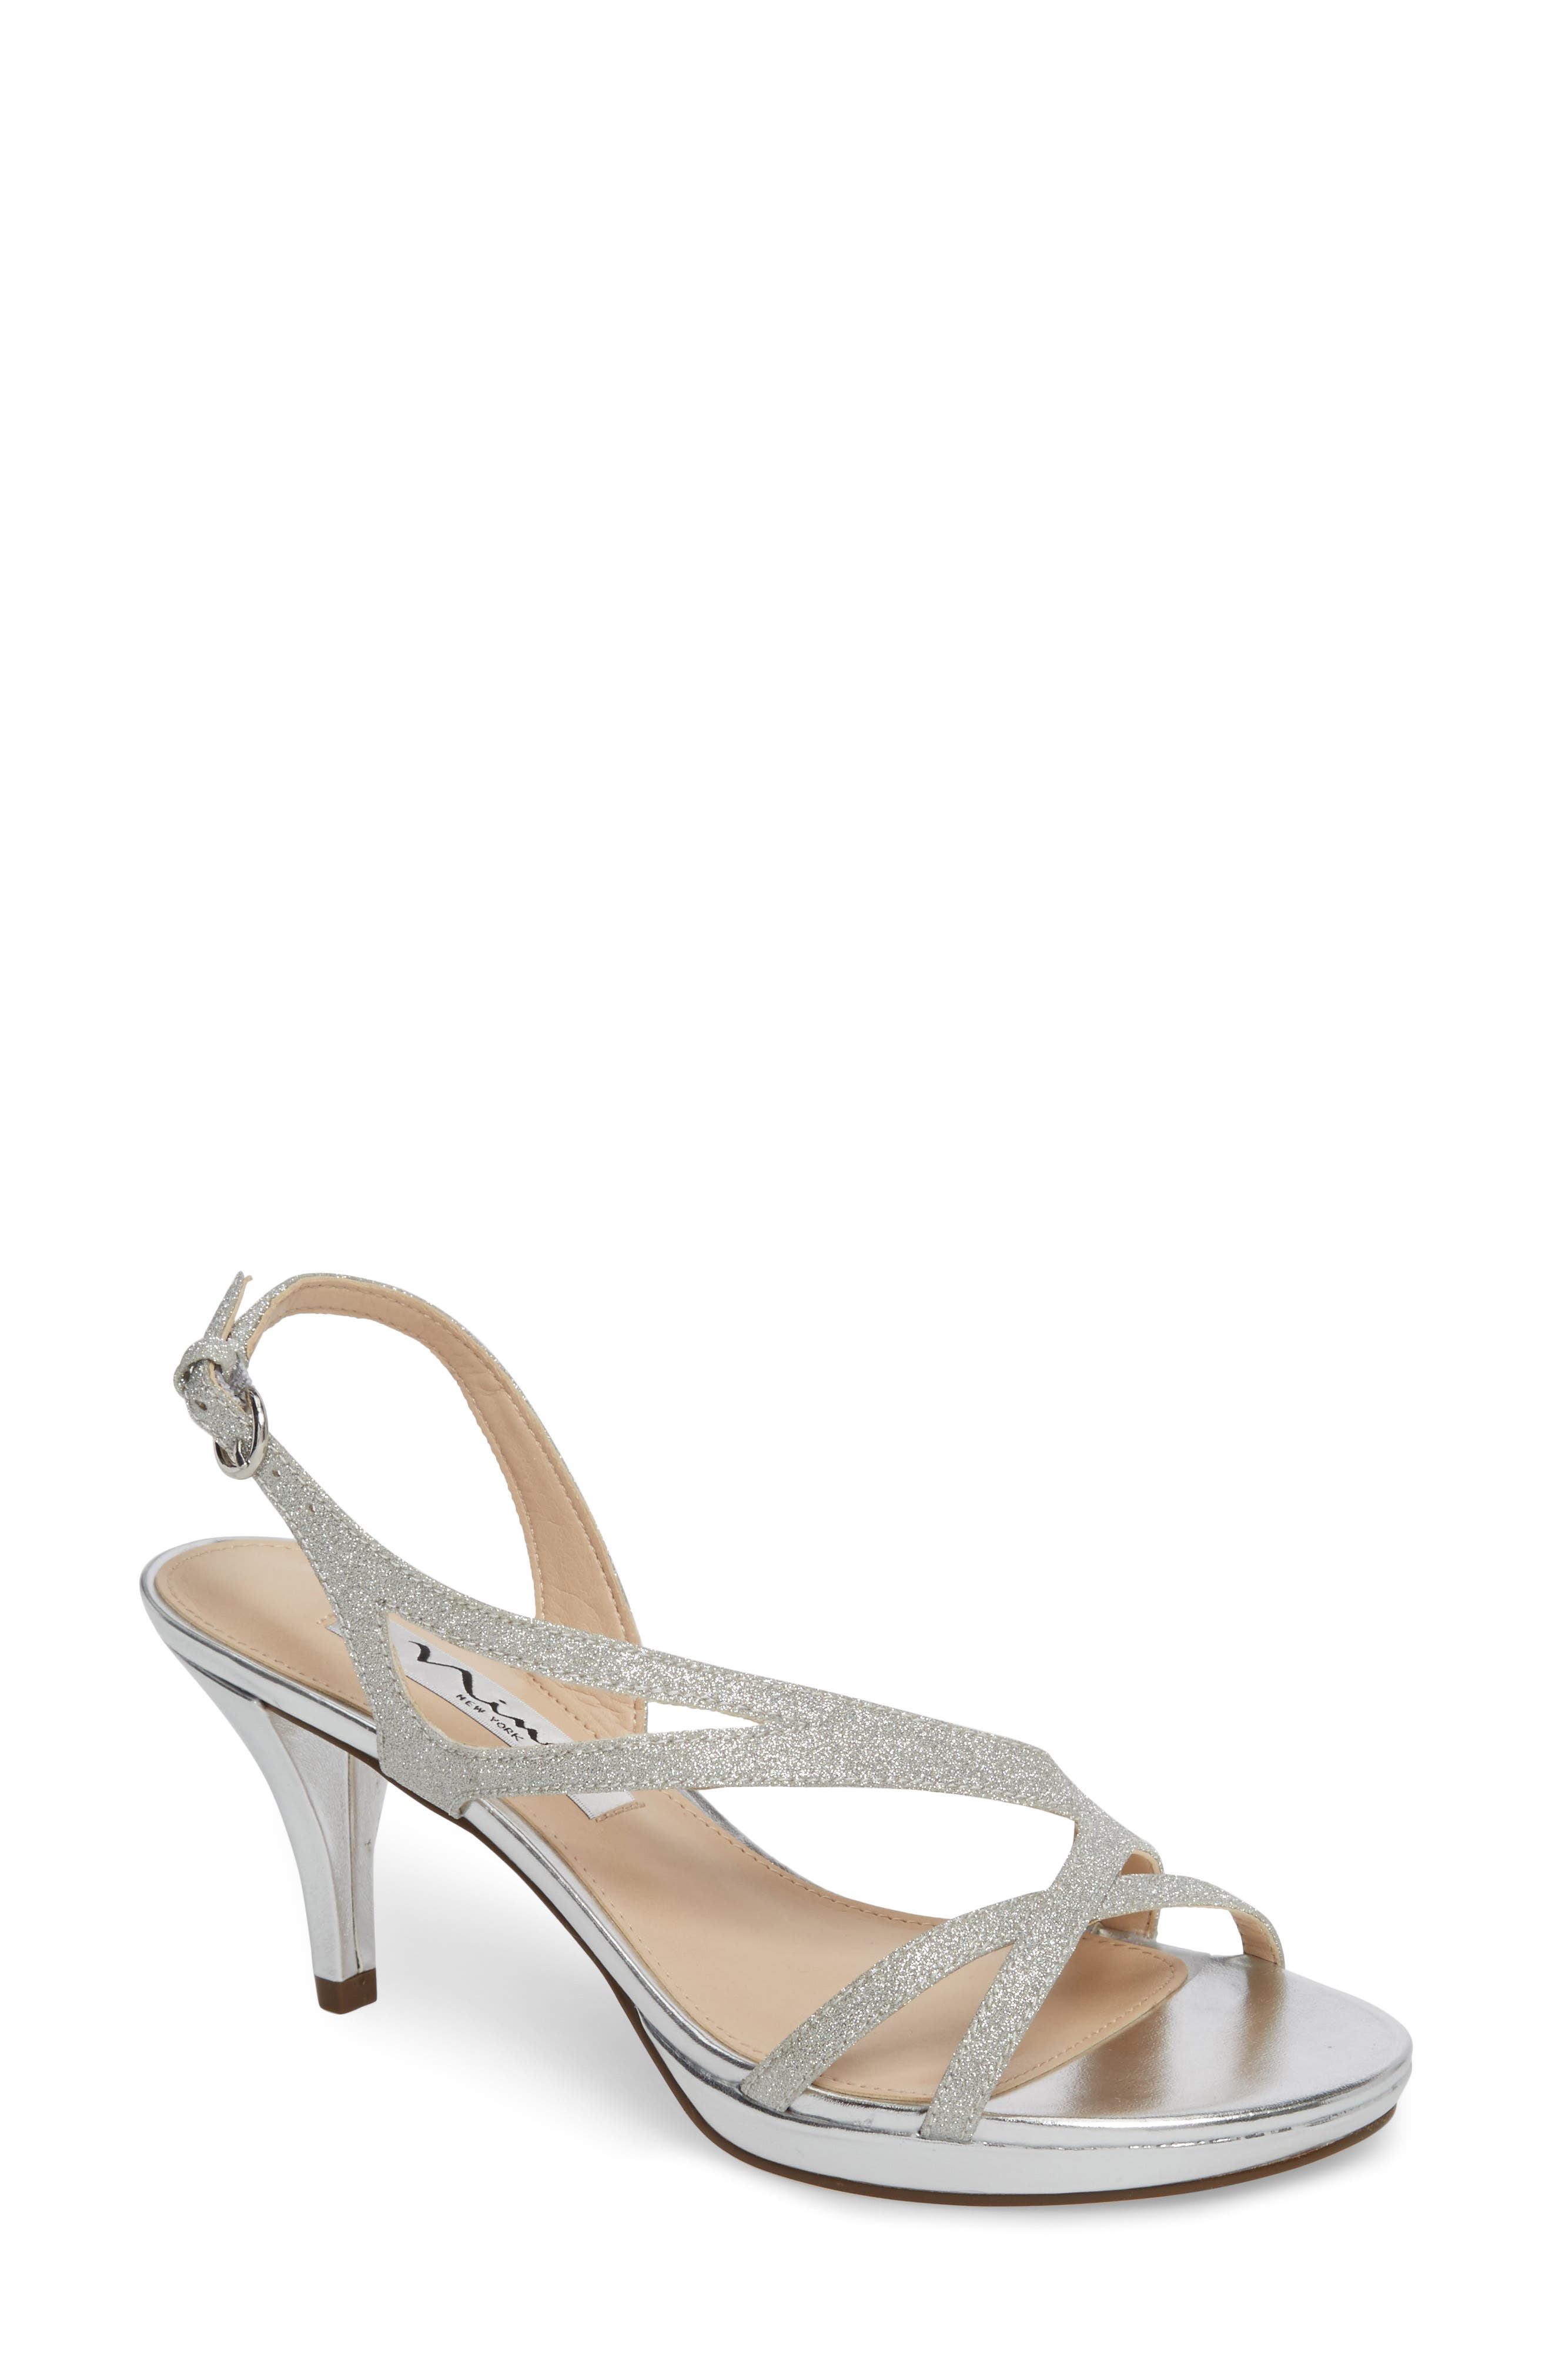 Nura Sandal,                         Main,                         color, Silver Glitter Fabric